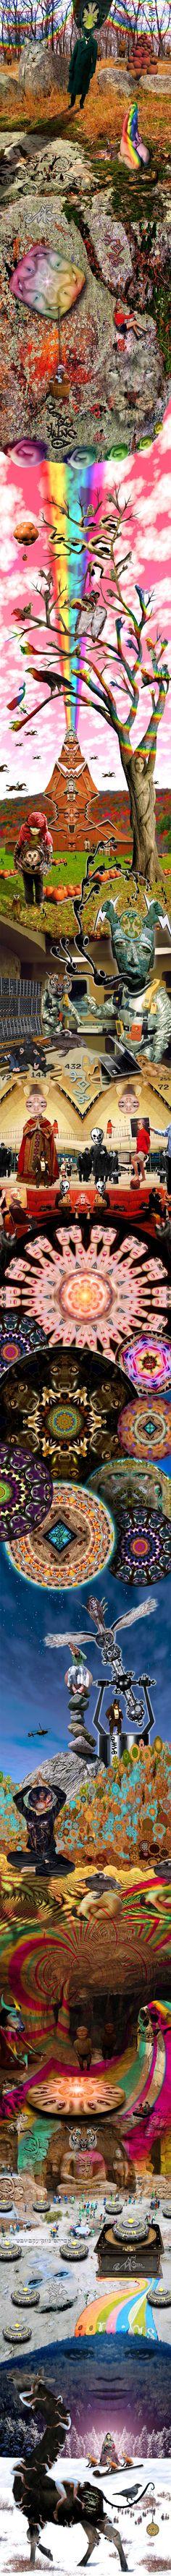 Larry Carlson - STRANGE HARVEST digital collage scroll artwork, 2008.